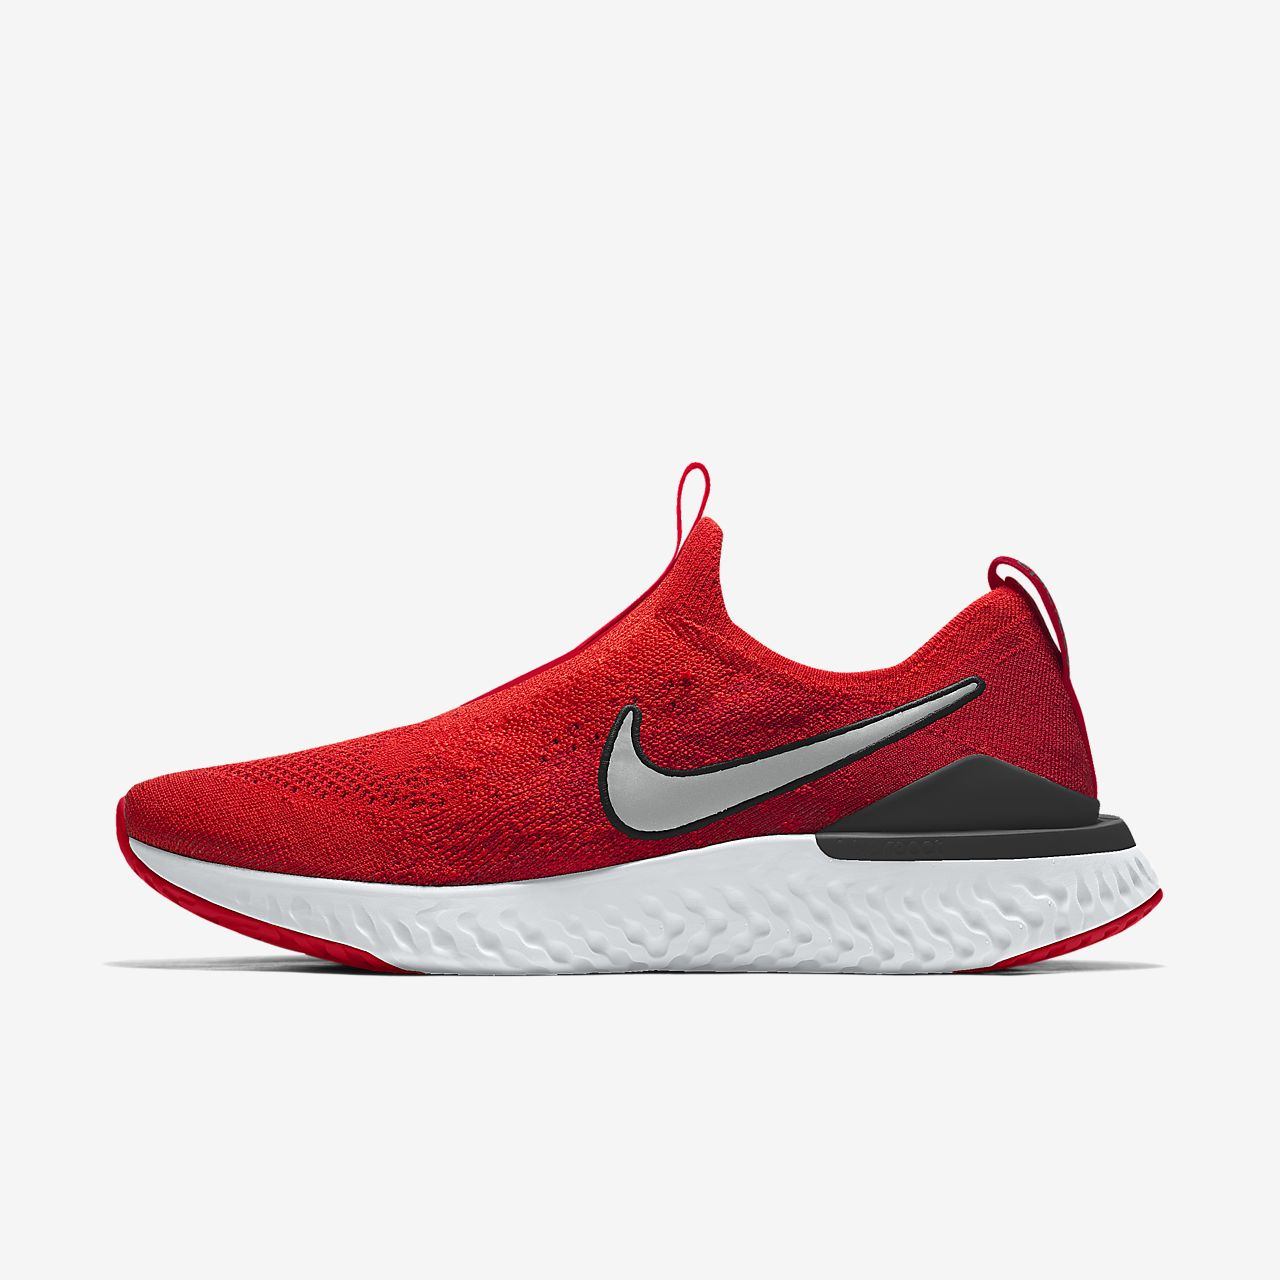 Nike Epic Phantom React Flyknit By You Zapatillas de running personalizables - Hombre